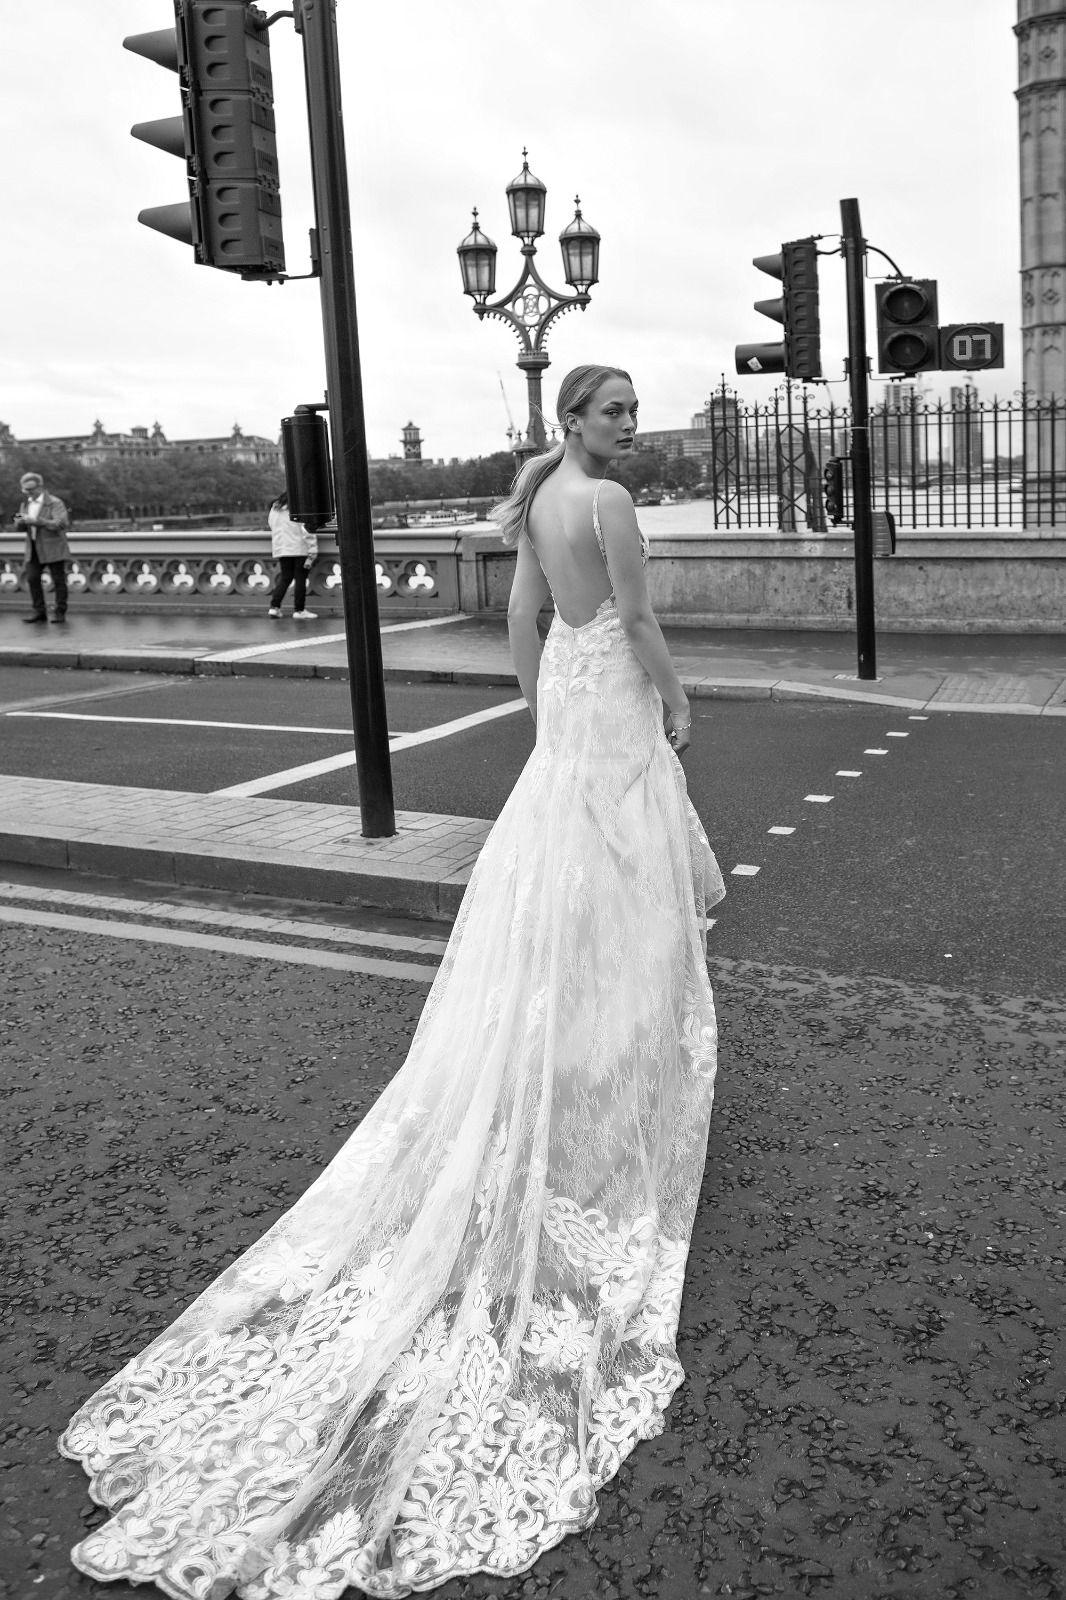 2cbbbc9234d Bridal in Newcastle 25th -27th November www.sibridal.com  sibridal   rikidalal  mayfaircollection  trunkshow  mayfair  bridal  weddingdress   rikidalalbridal ...